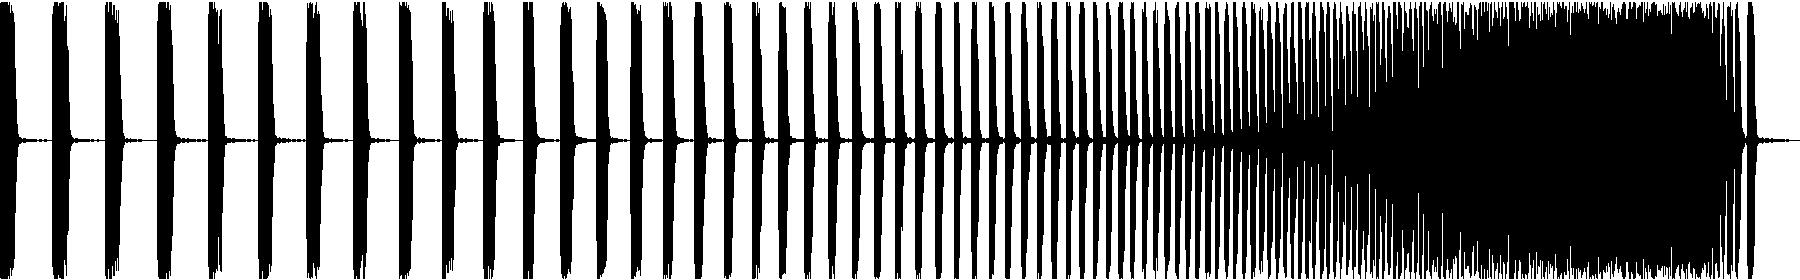 vuf1 128bpm accerlator chord 8bars c